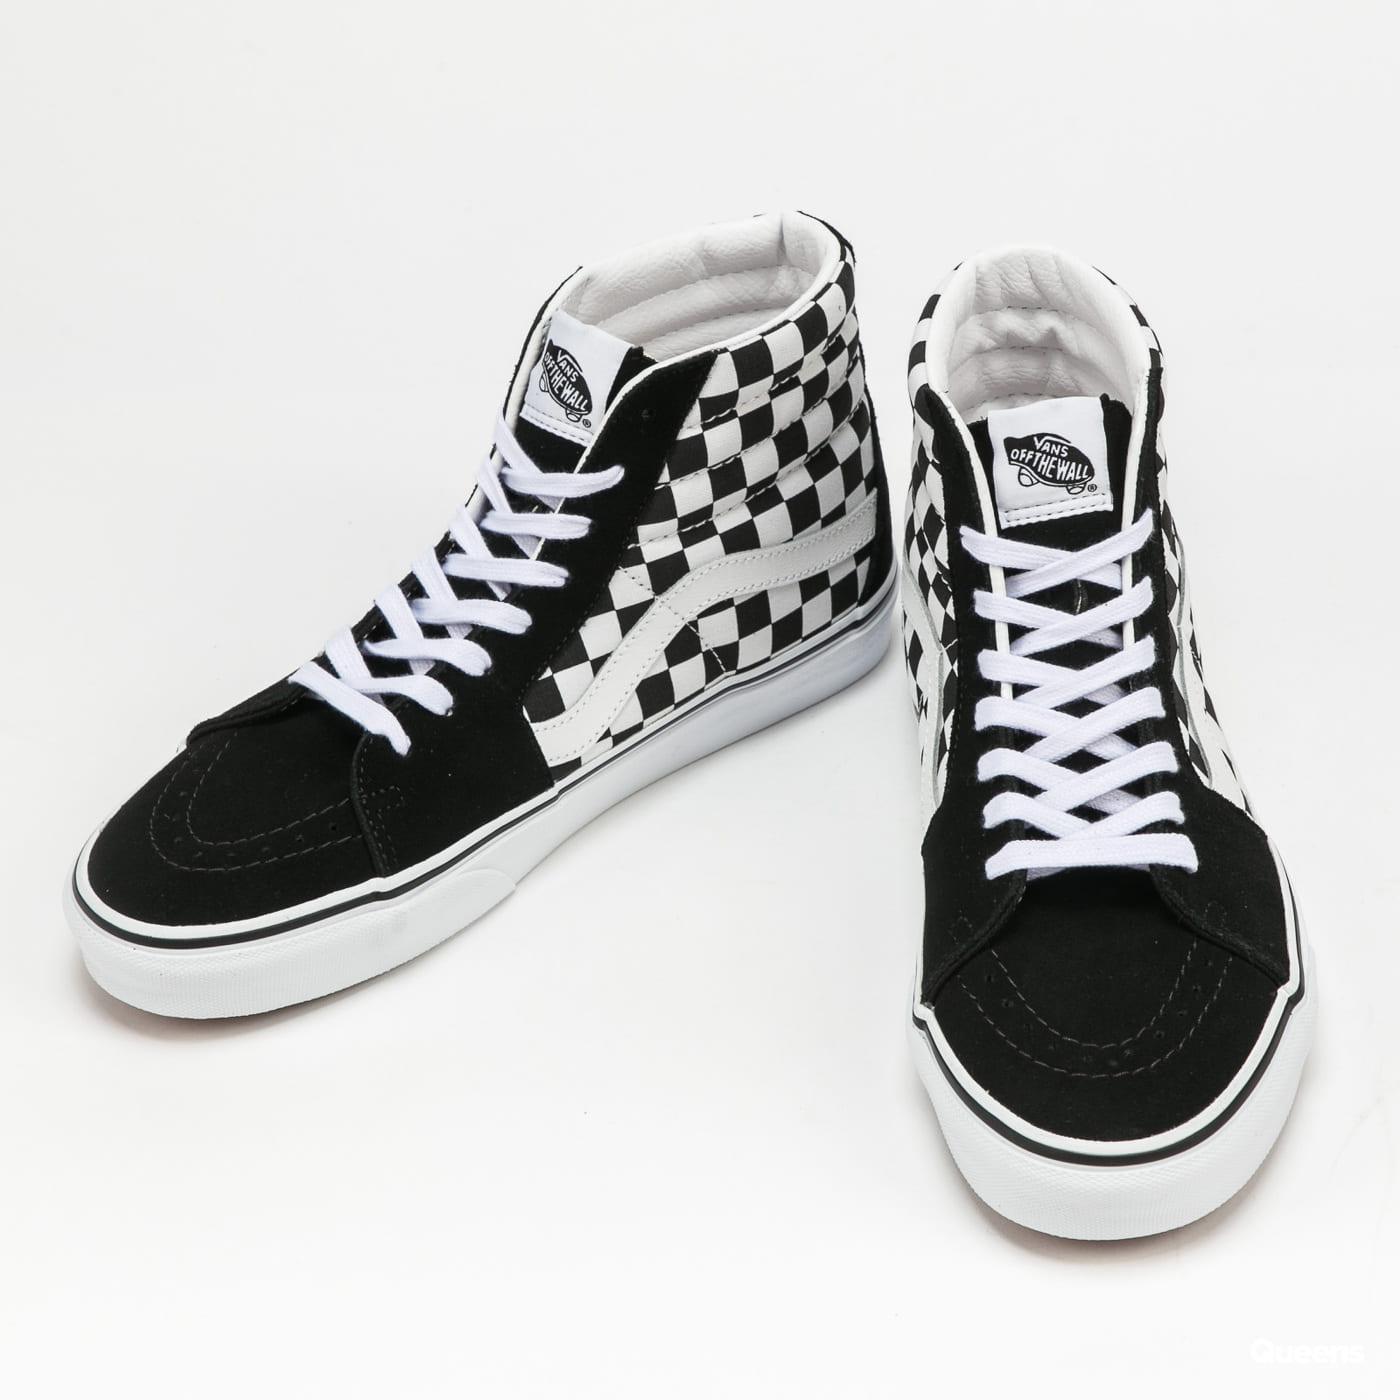 Vans SK8 - Hi (checkerboard) black / true white